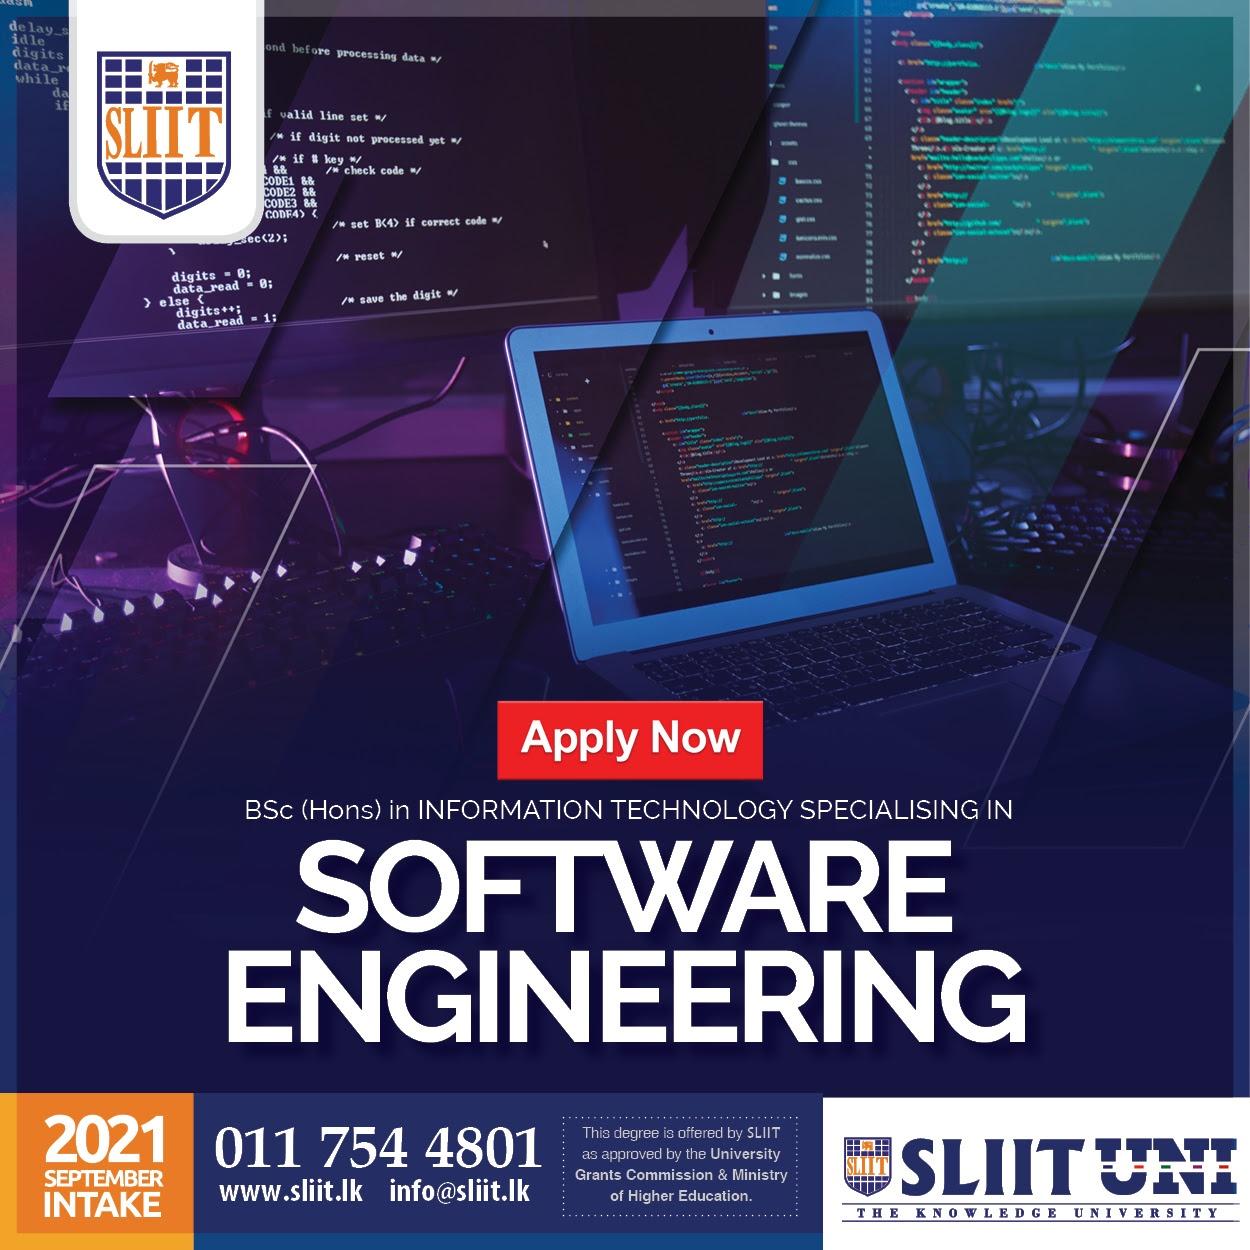 BSc (Hons) in Software Engineering at SLIIT